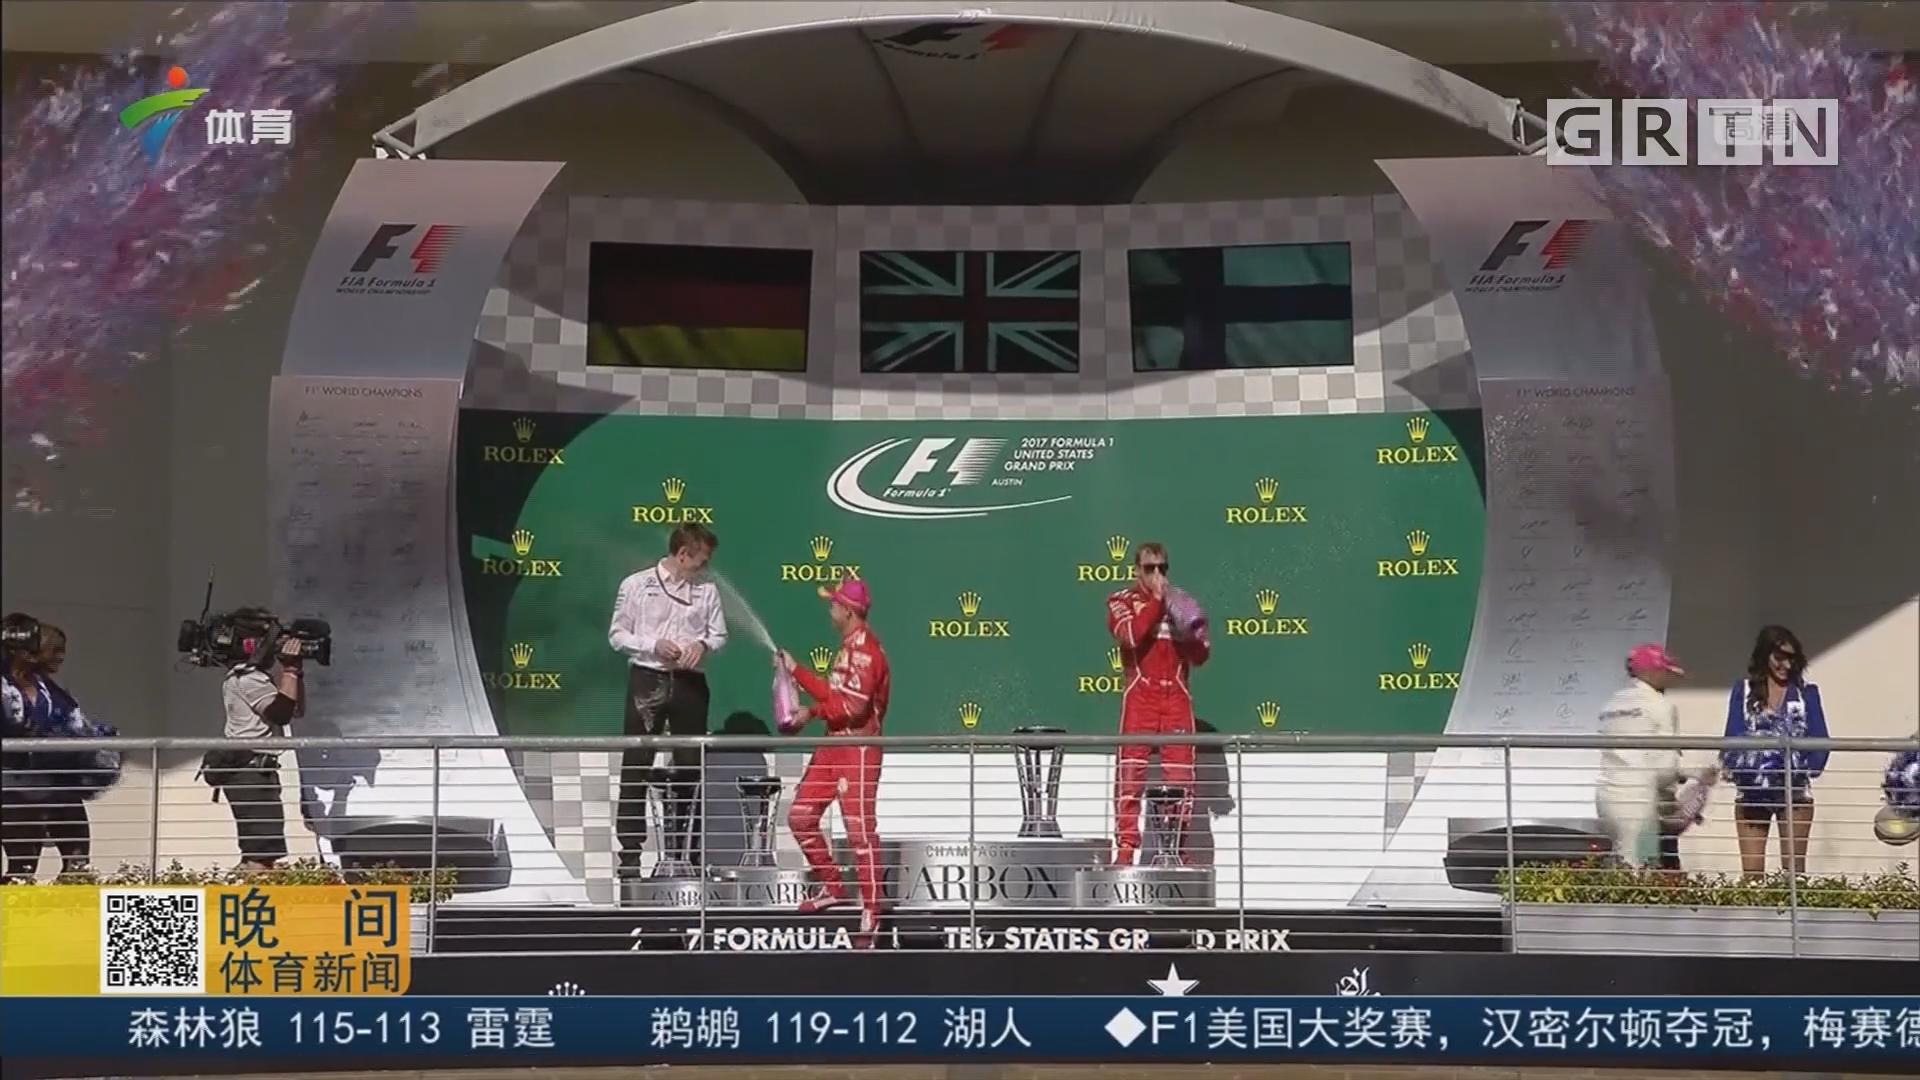 F1美国站 汉密尔顿夺冠 梅奔车队提前卫冕